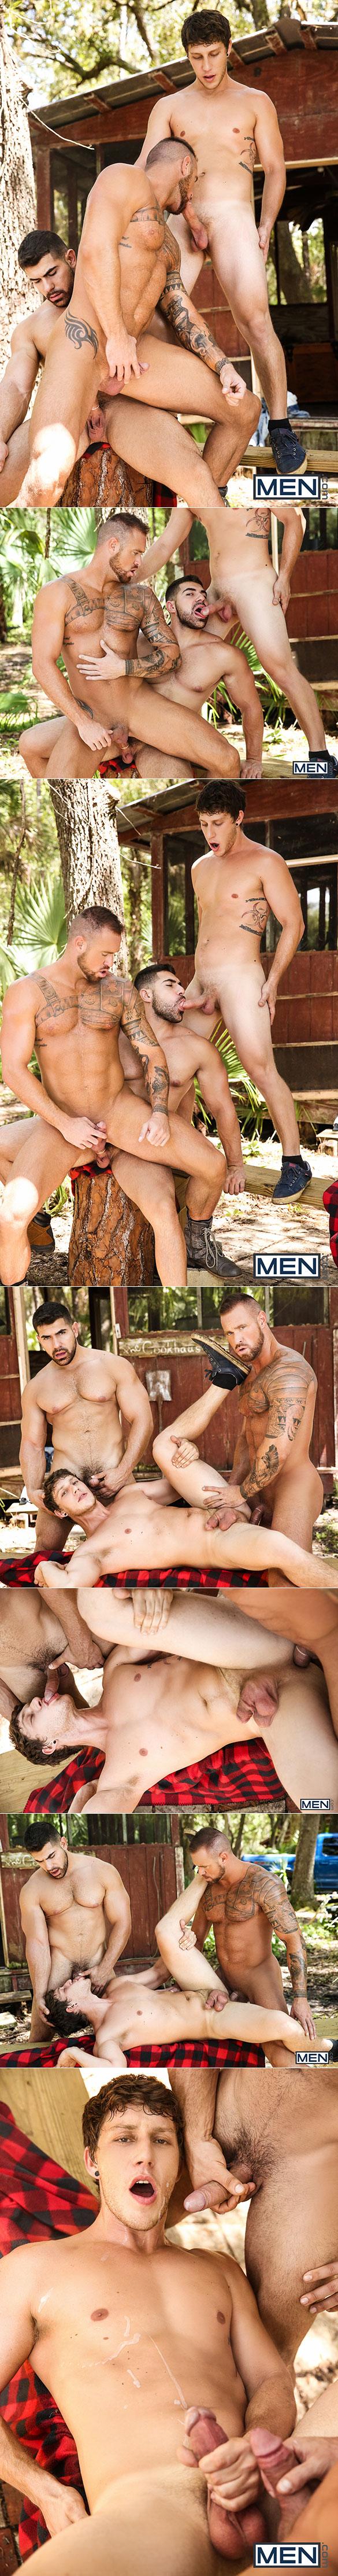 "Men.com: Damien Stone, Michael Roman and Paul Canon's hot threeway fuck in ""The Bayou, Part 3"""